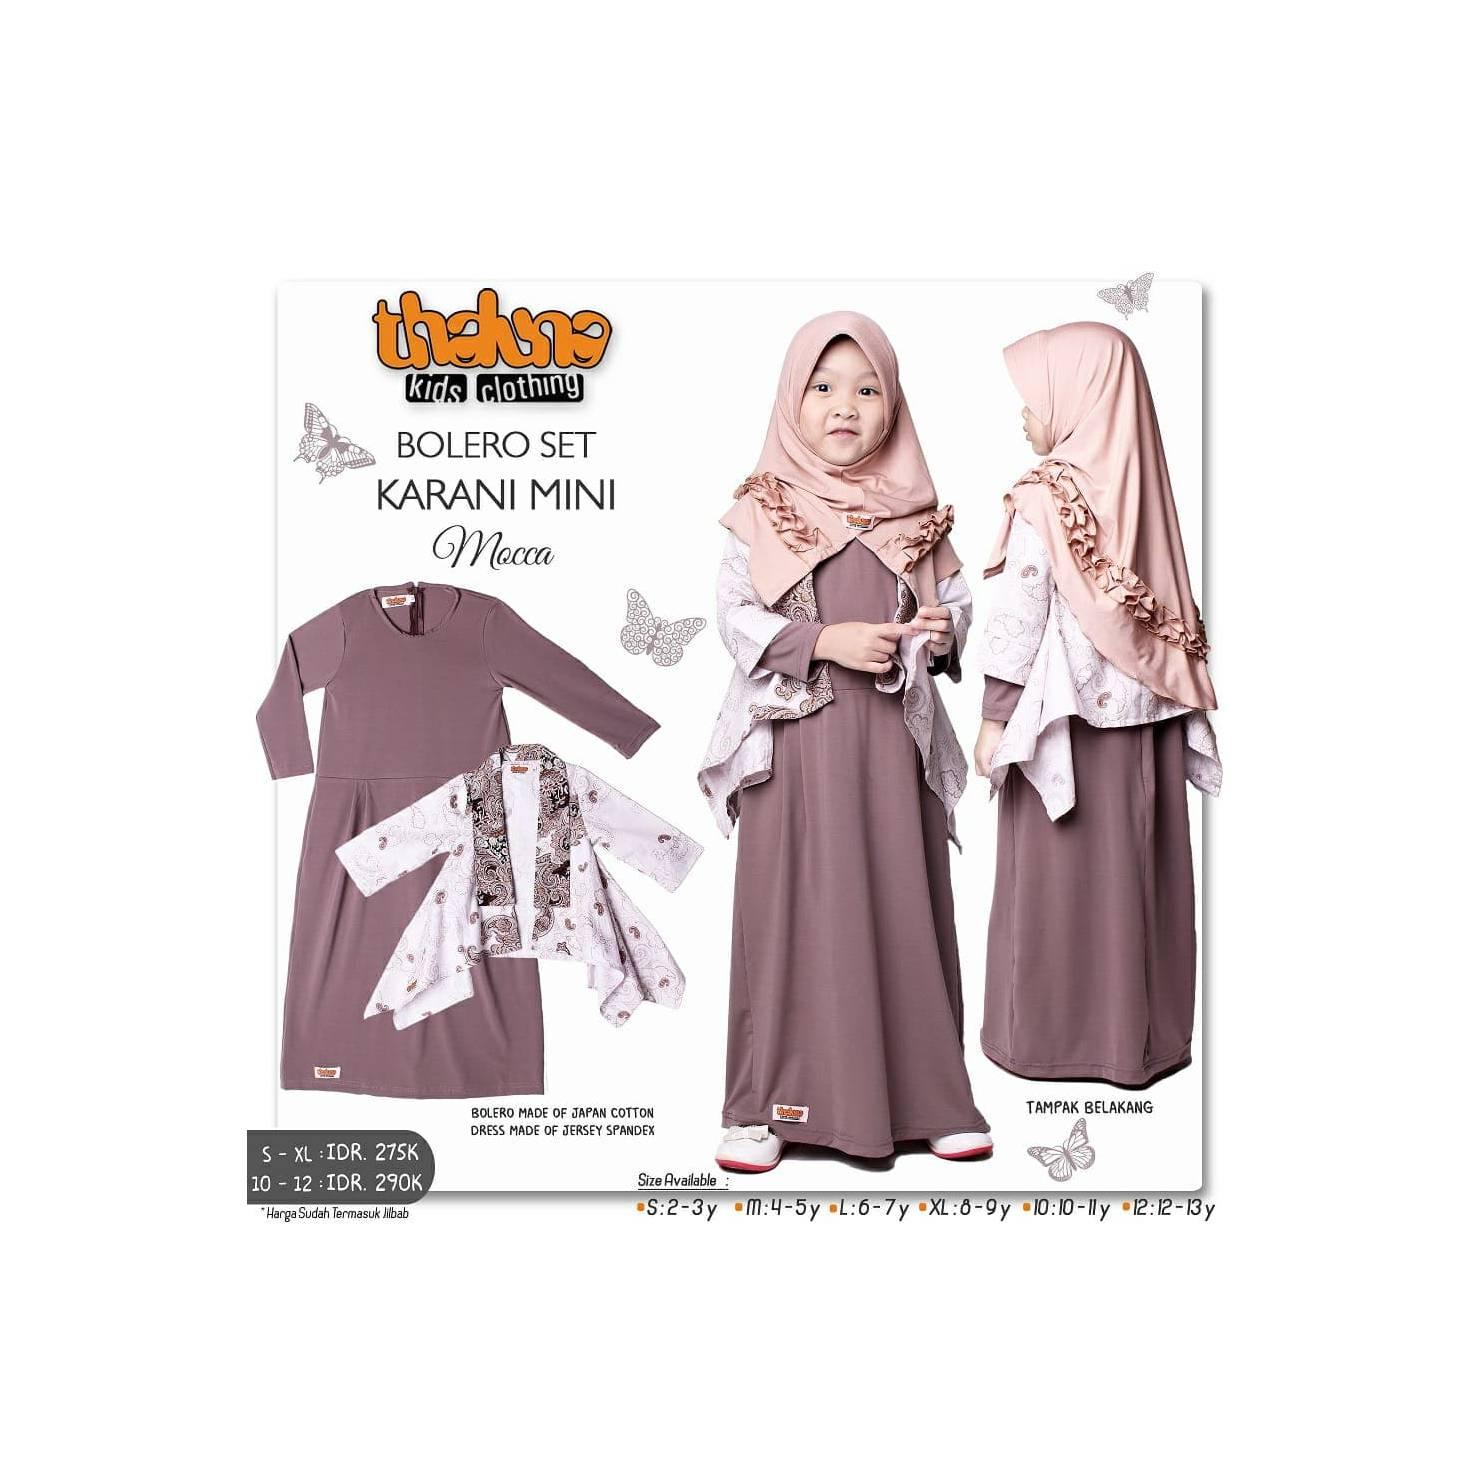 Gamis anak set jilbab - bolero batik anak - Baju keluarga - original